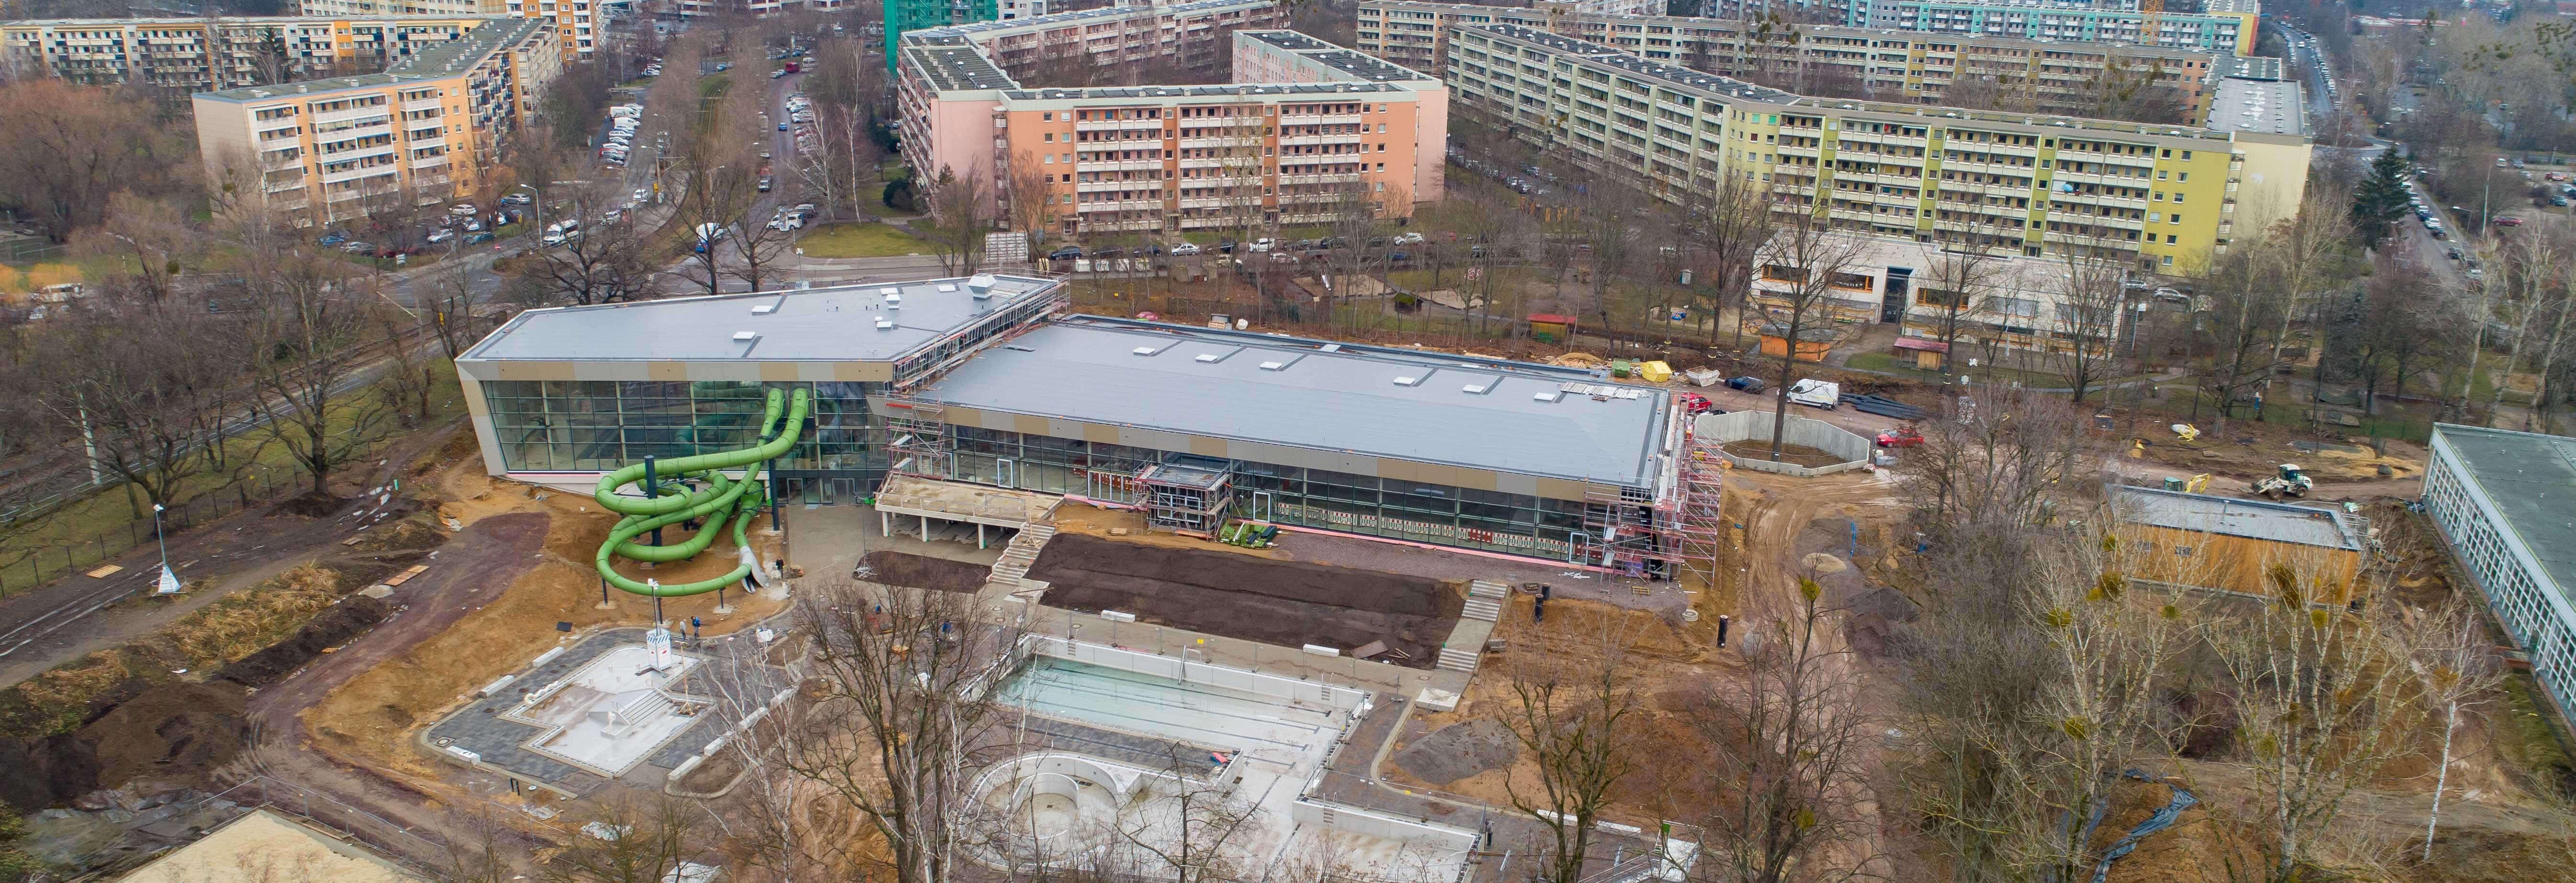 Baustand Februar 2021, Luftbild